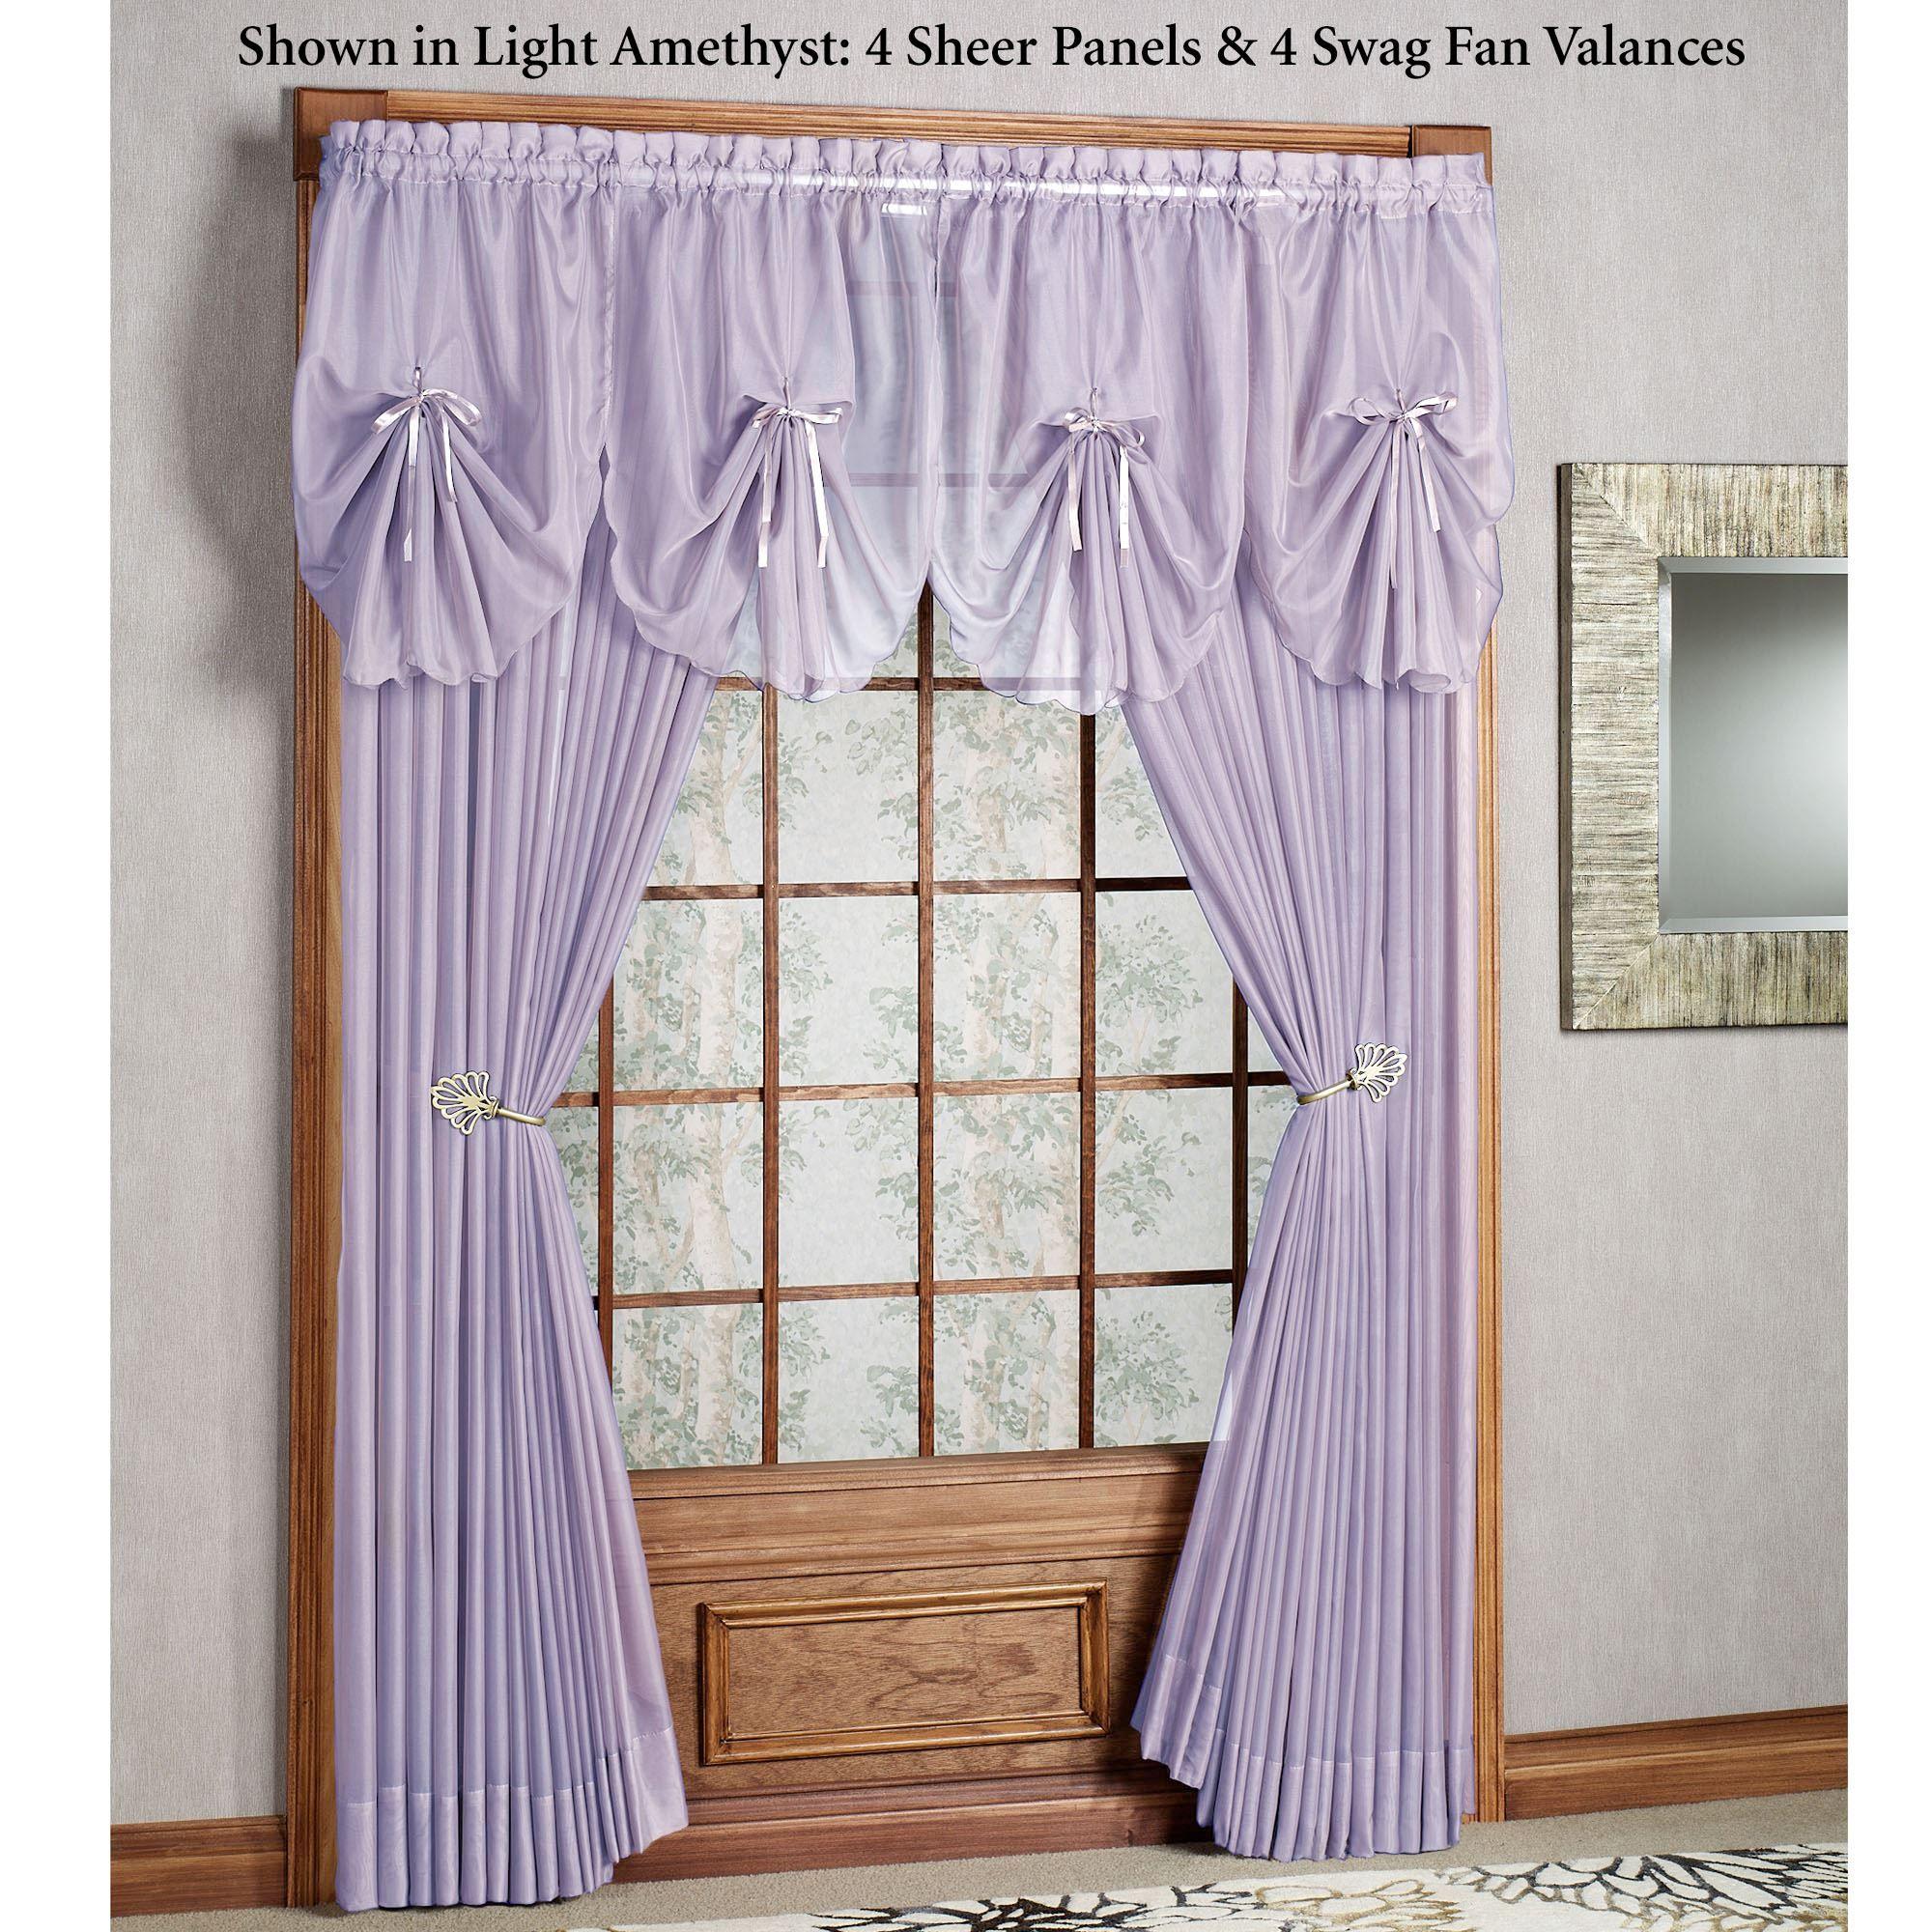 Luxury window coverings  emelia sheer window treatments  sheer curtains window and window